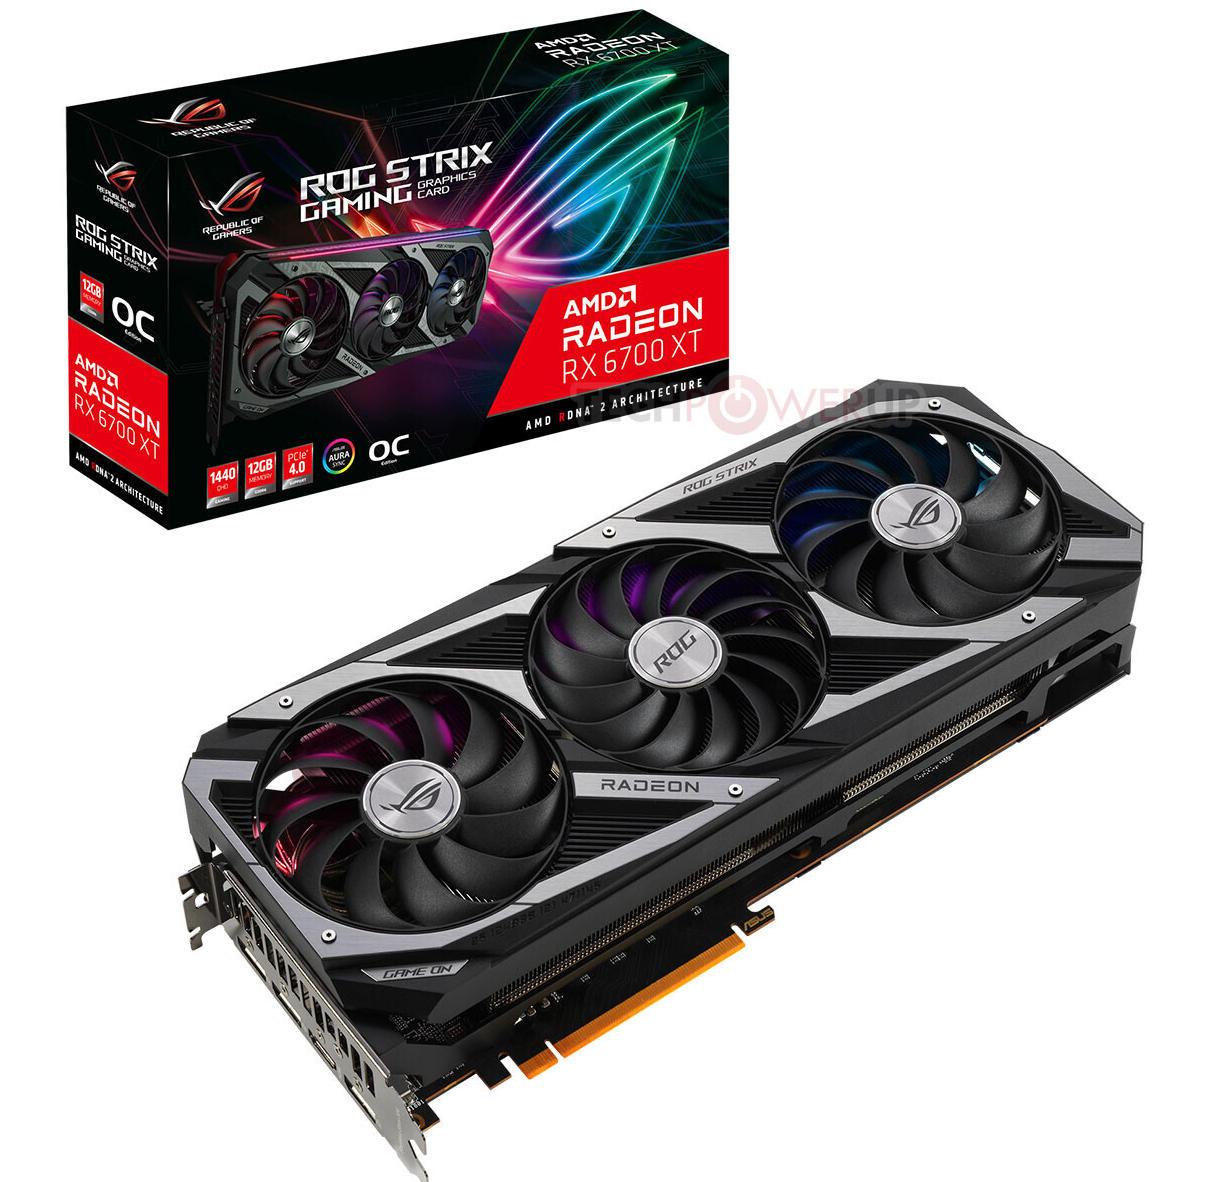 ASUS Radeon RX 6700 XT